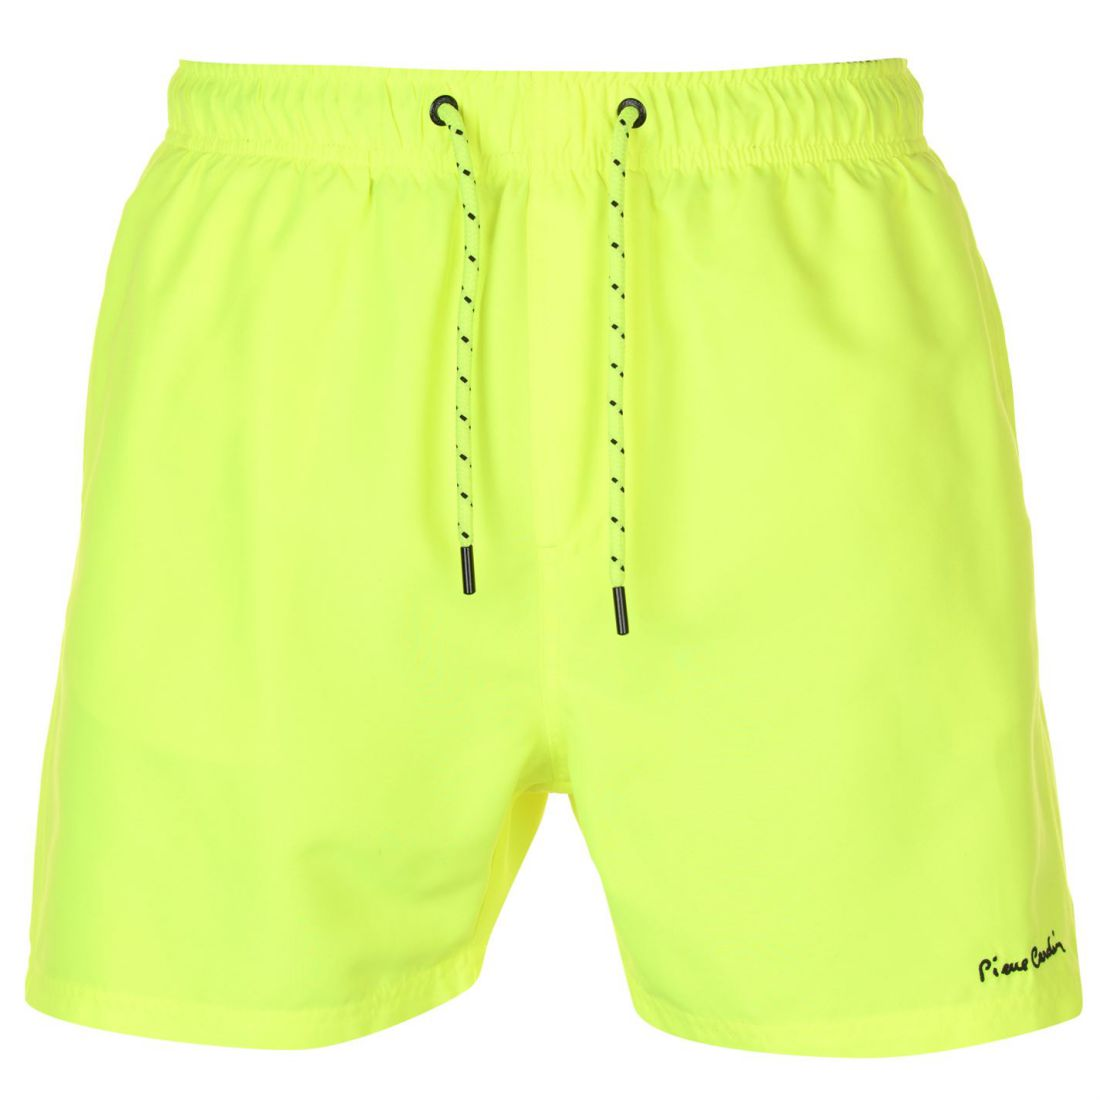 ff26562850 Pierre Cardin Neon Swim Shorts Mens Gents Pants Trousers Bottoms ...